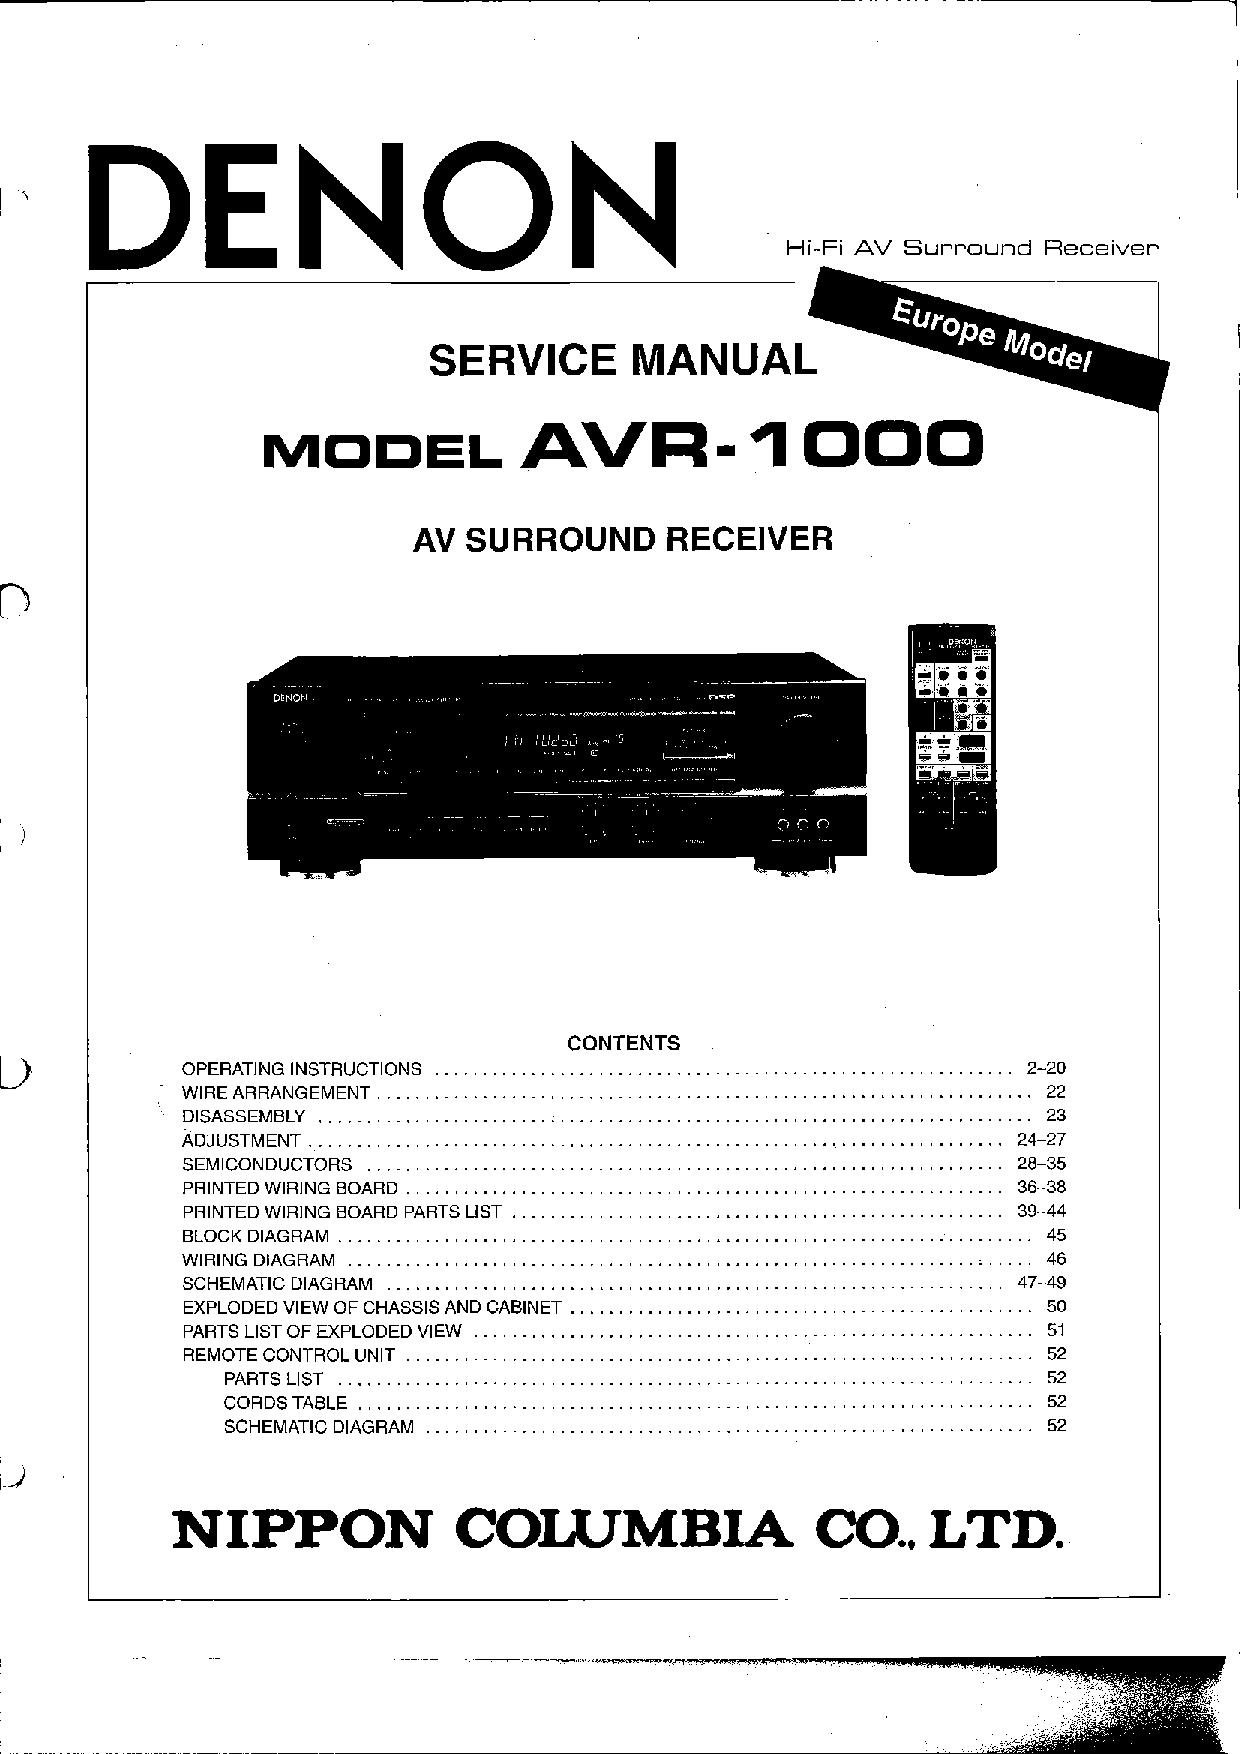 Denon AVR-1000 Service Manual